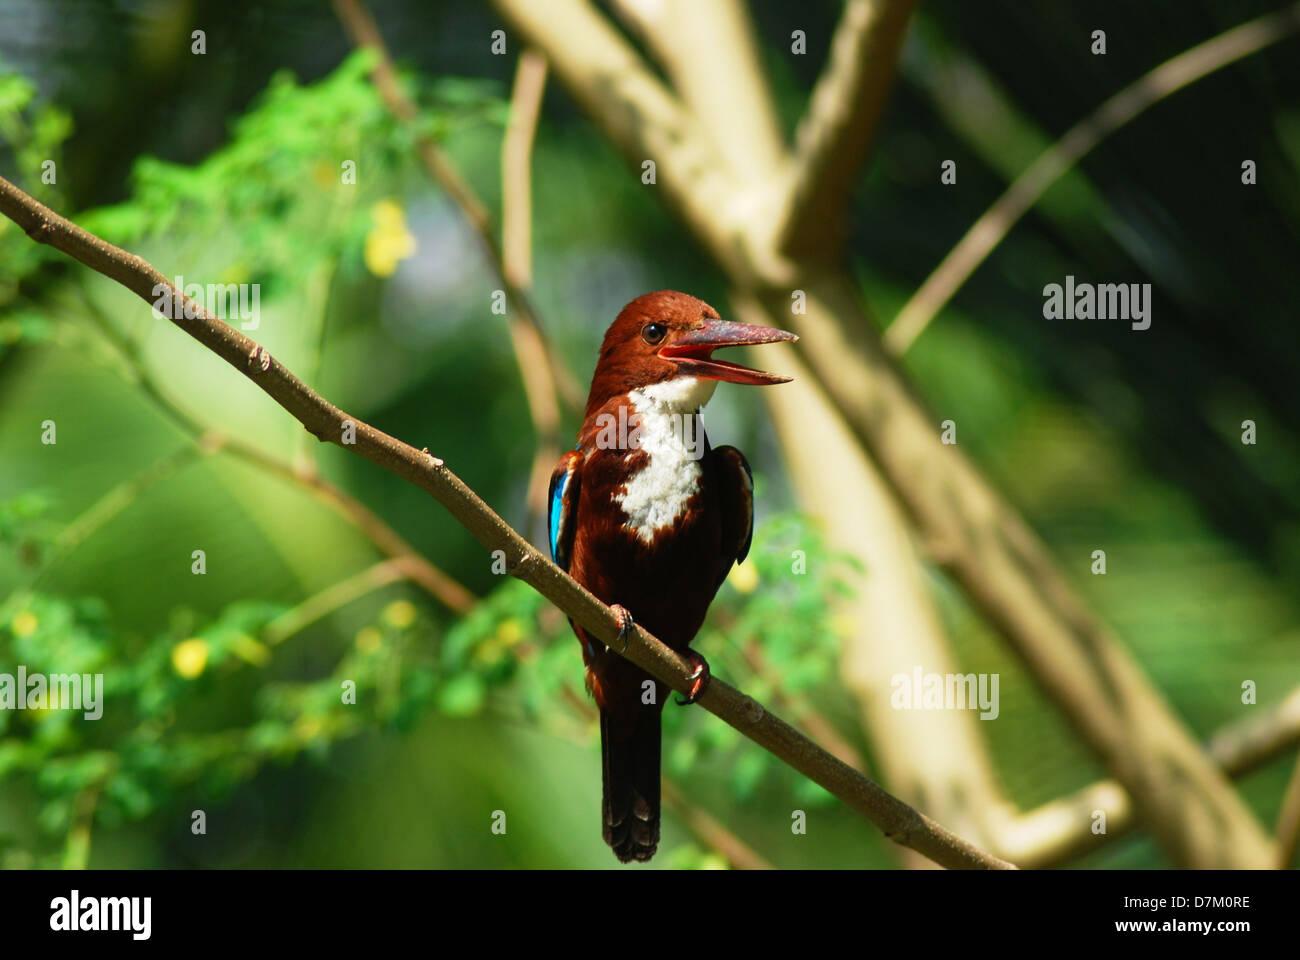 White-throated Kingfisher - Stock Image